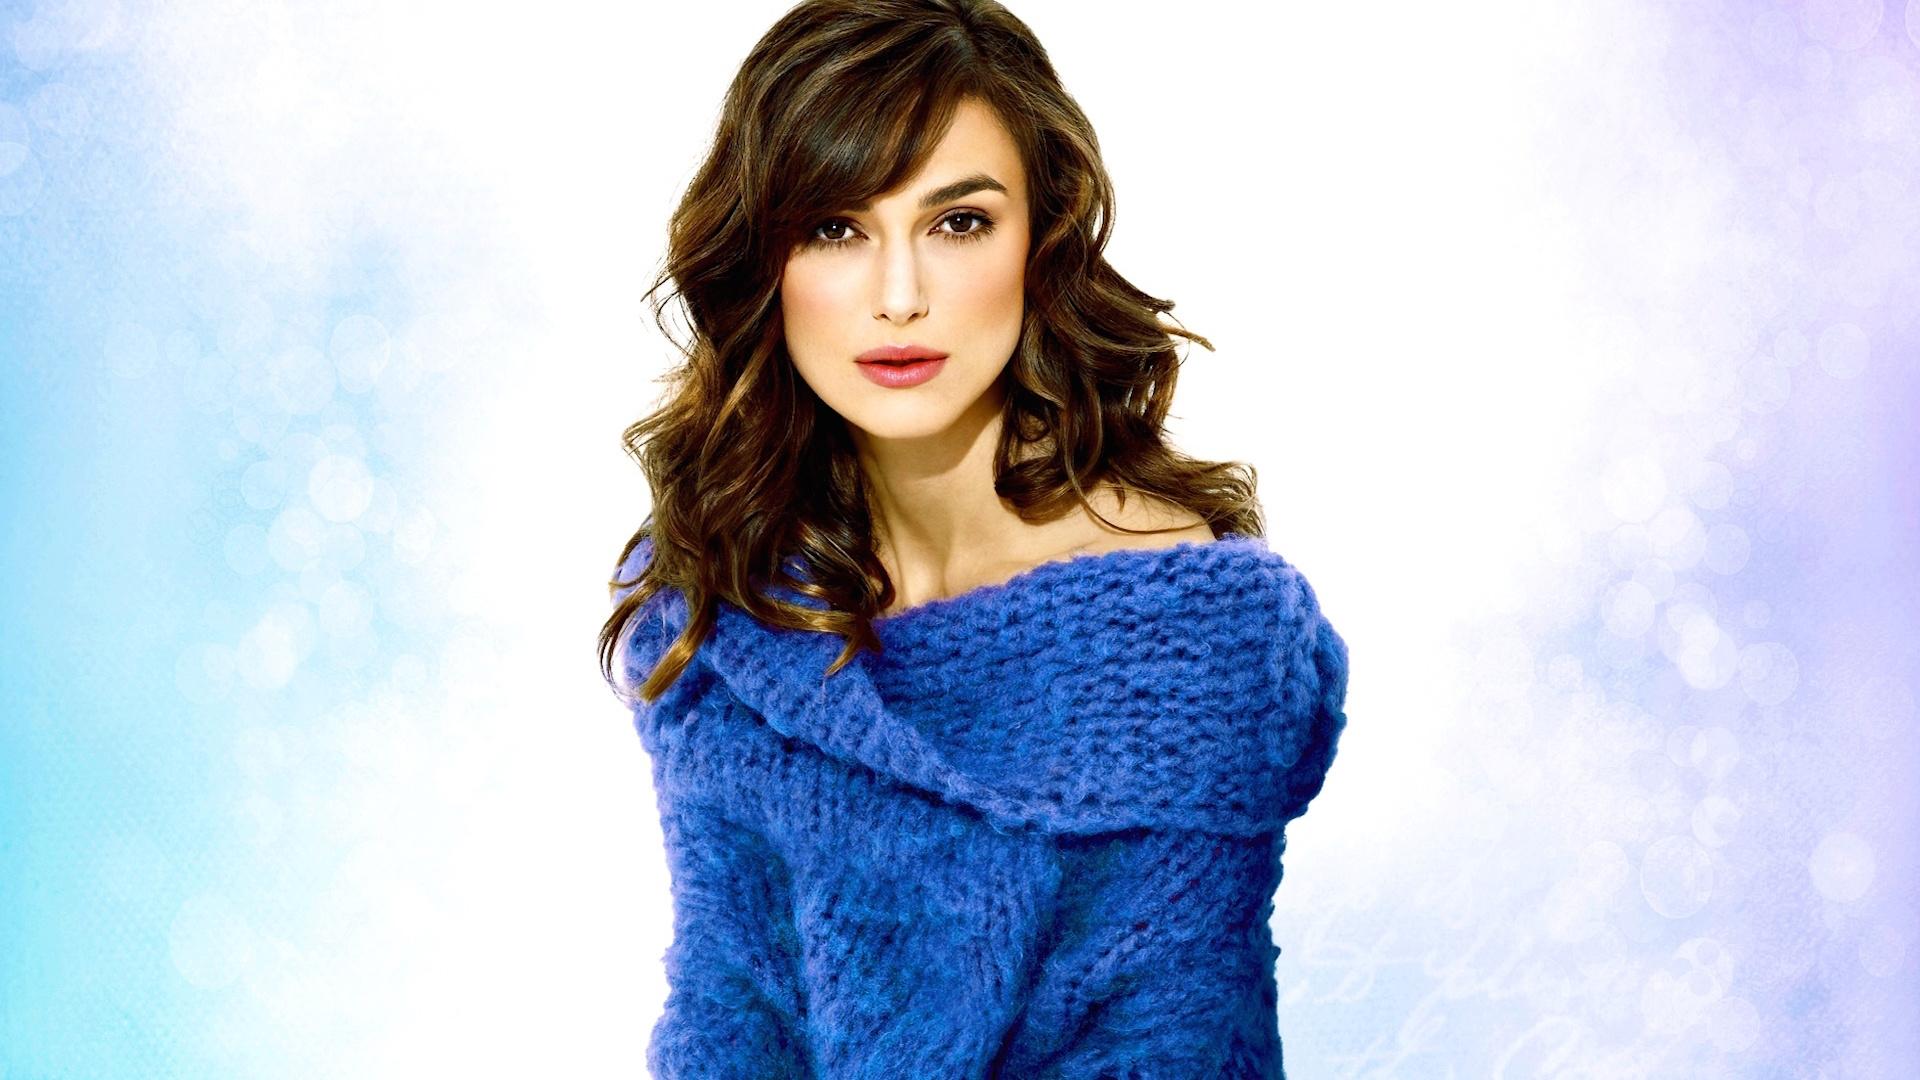 Keira Knightley in a stylish blue sweater